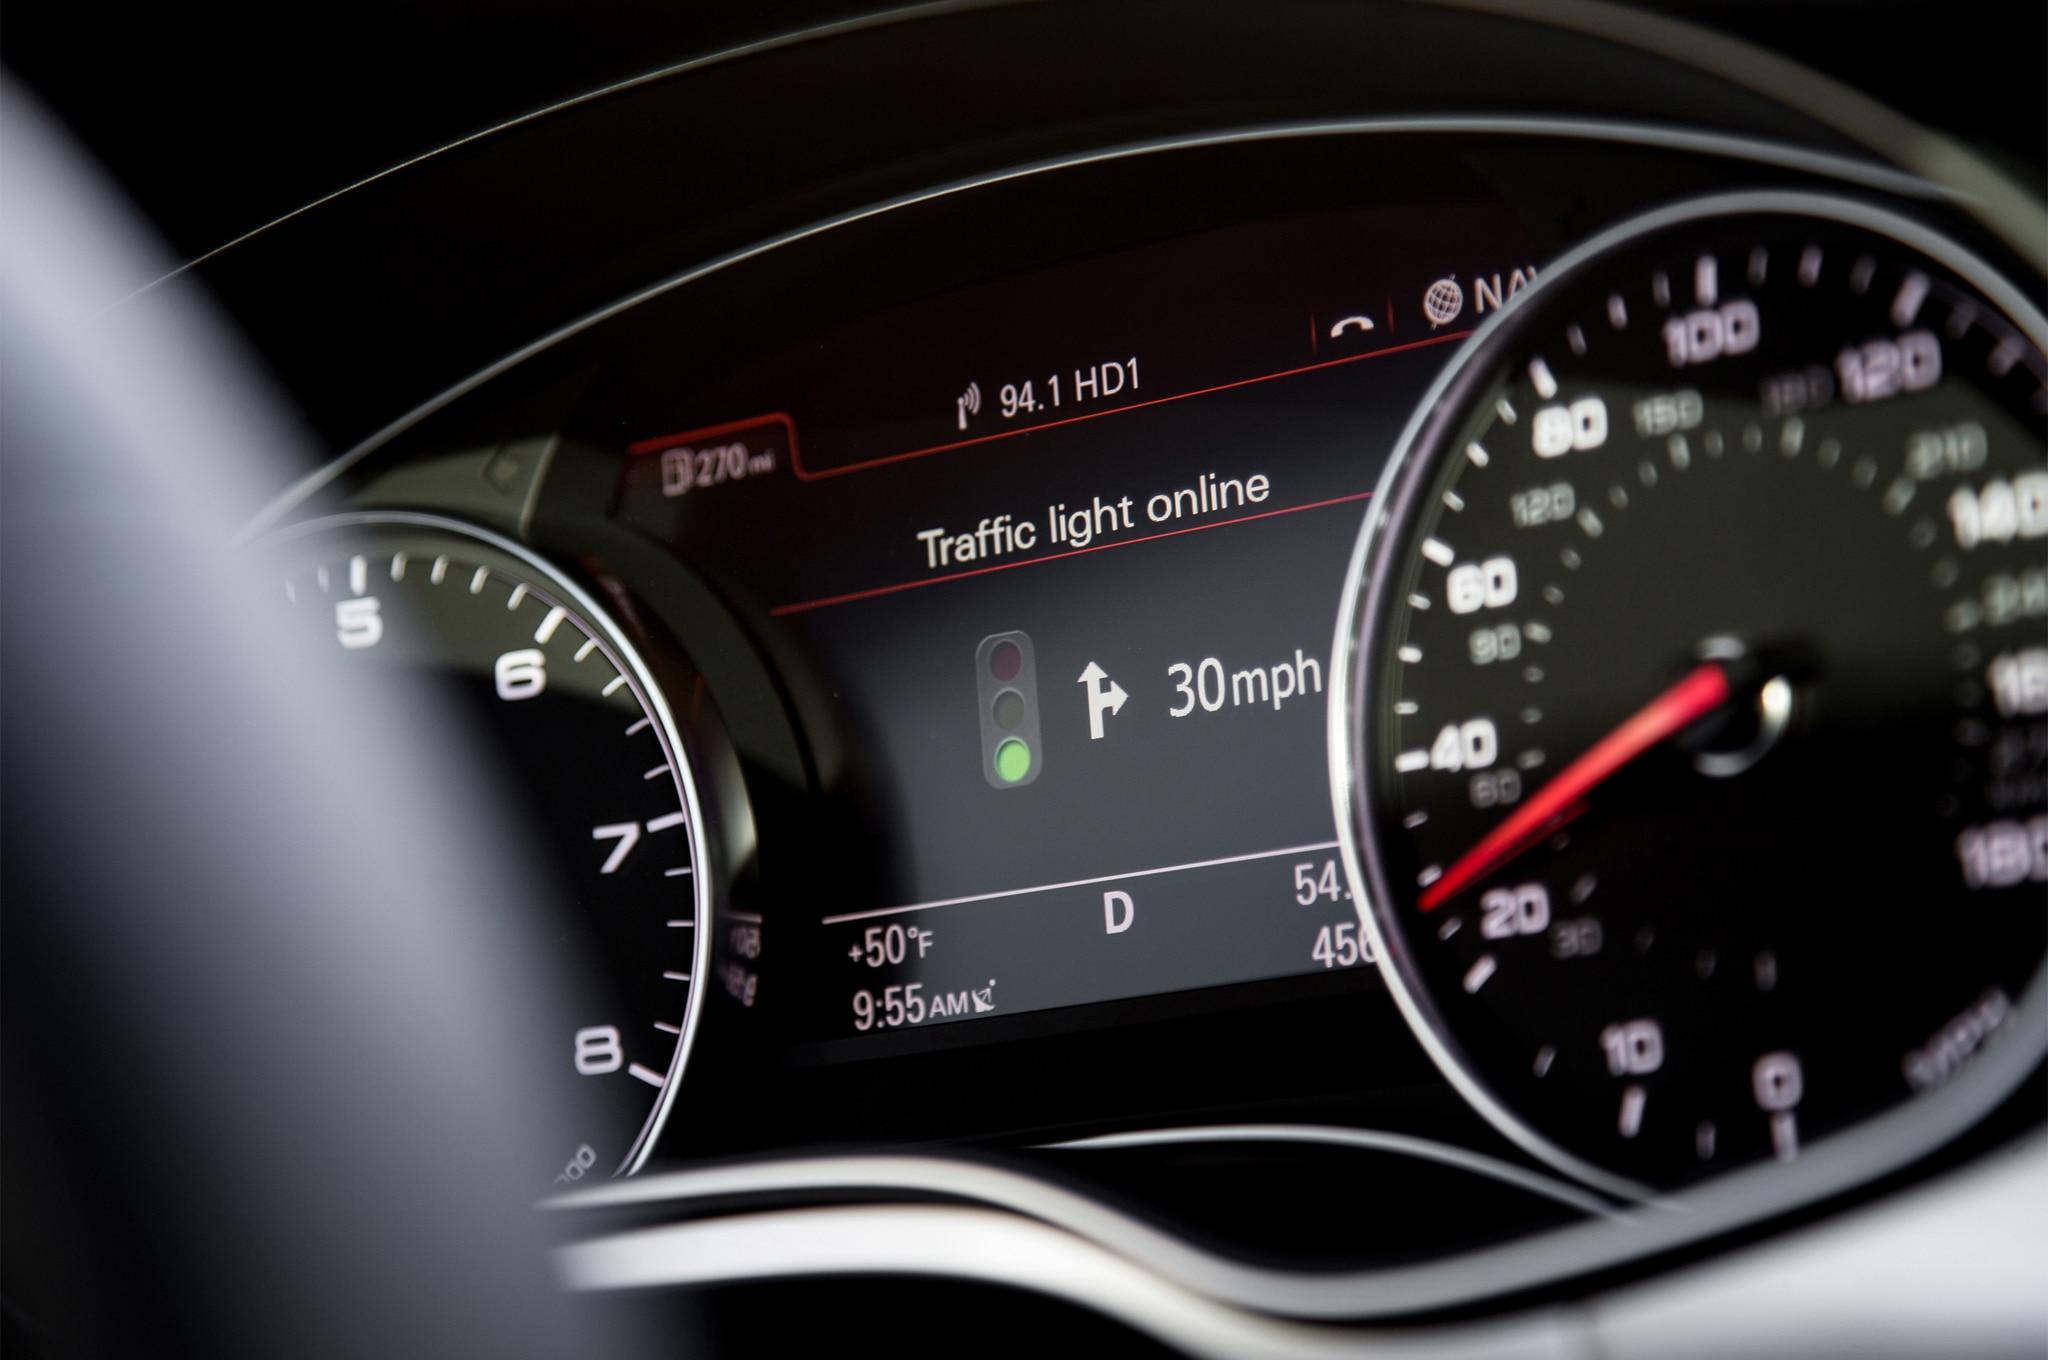 Audi Online Traffic Light System 21